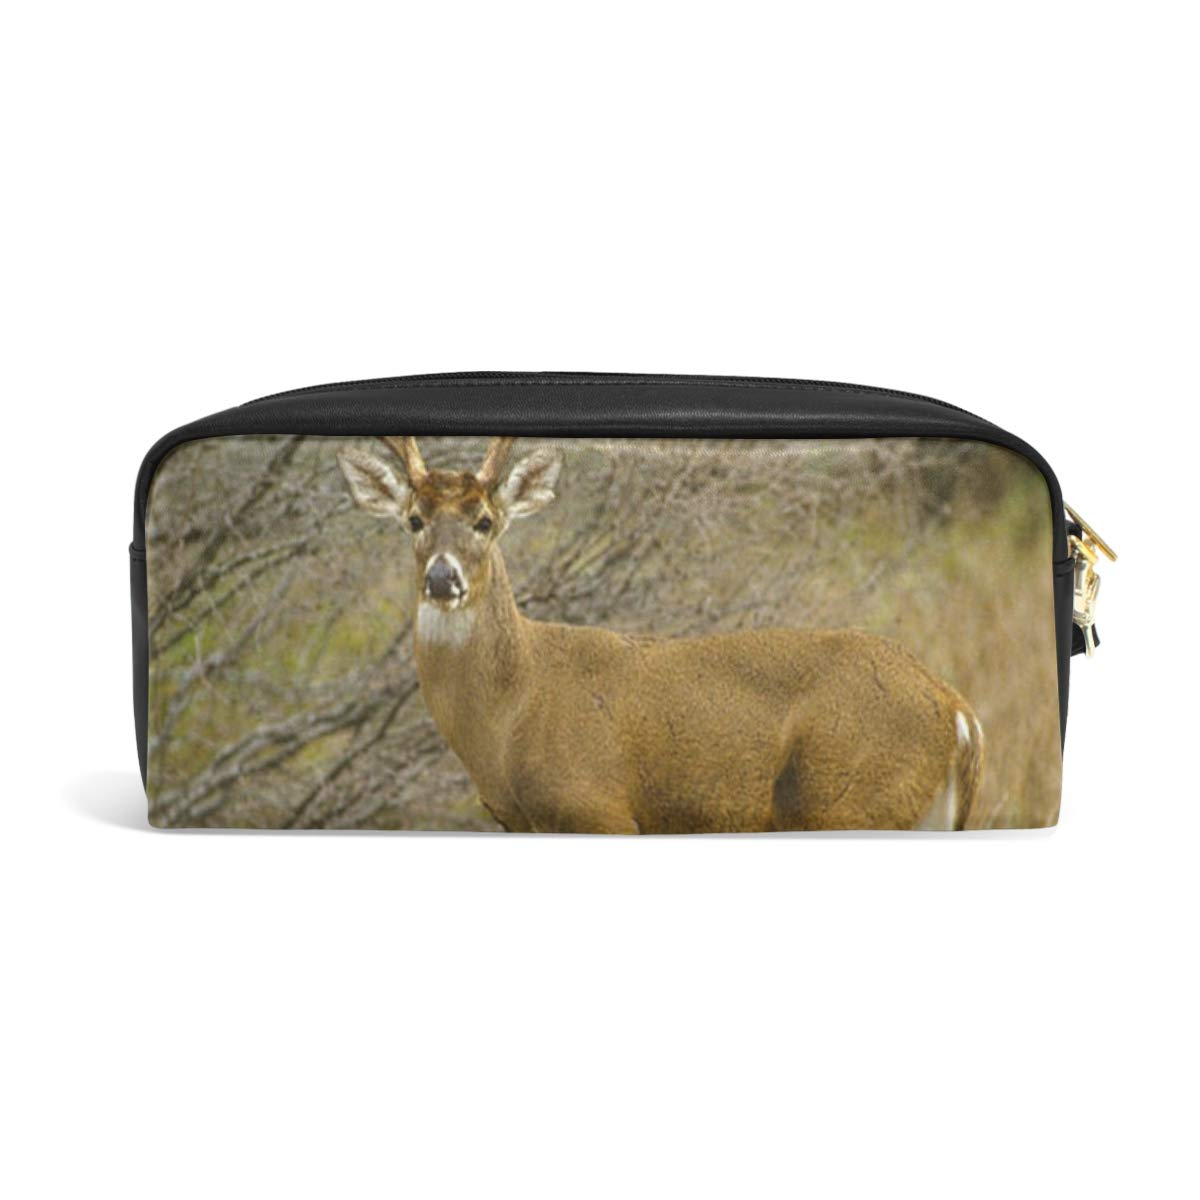 5e55b00171807 Amazon.com : Pencil Case/Makeup Bags Buck Stag Antlers Deer Big ...